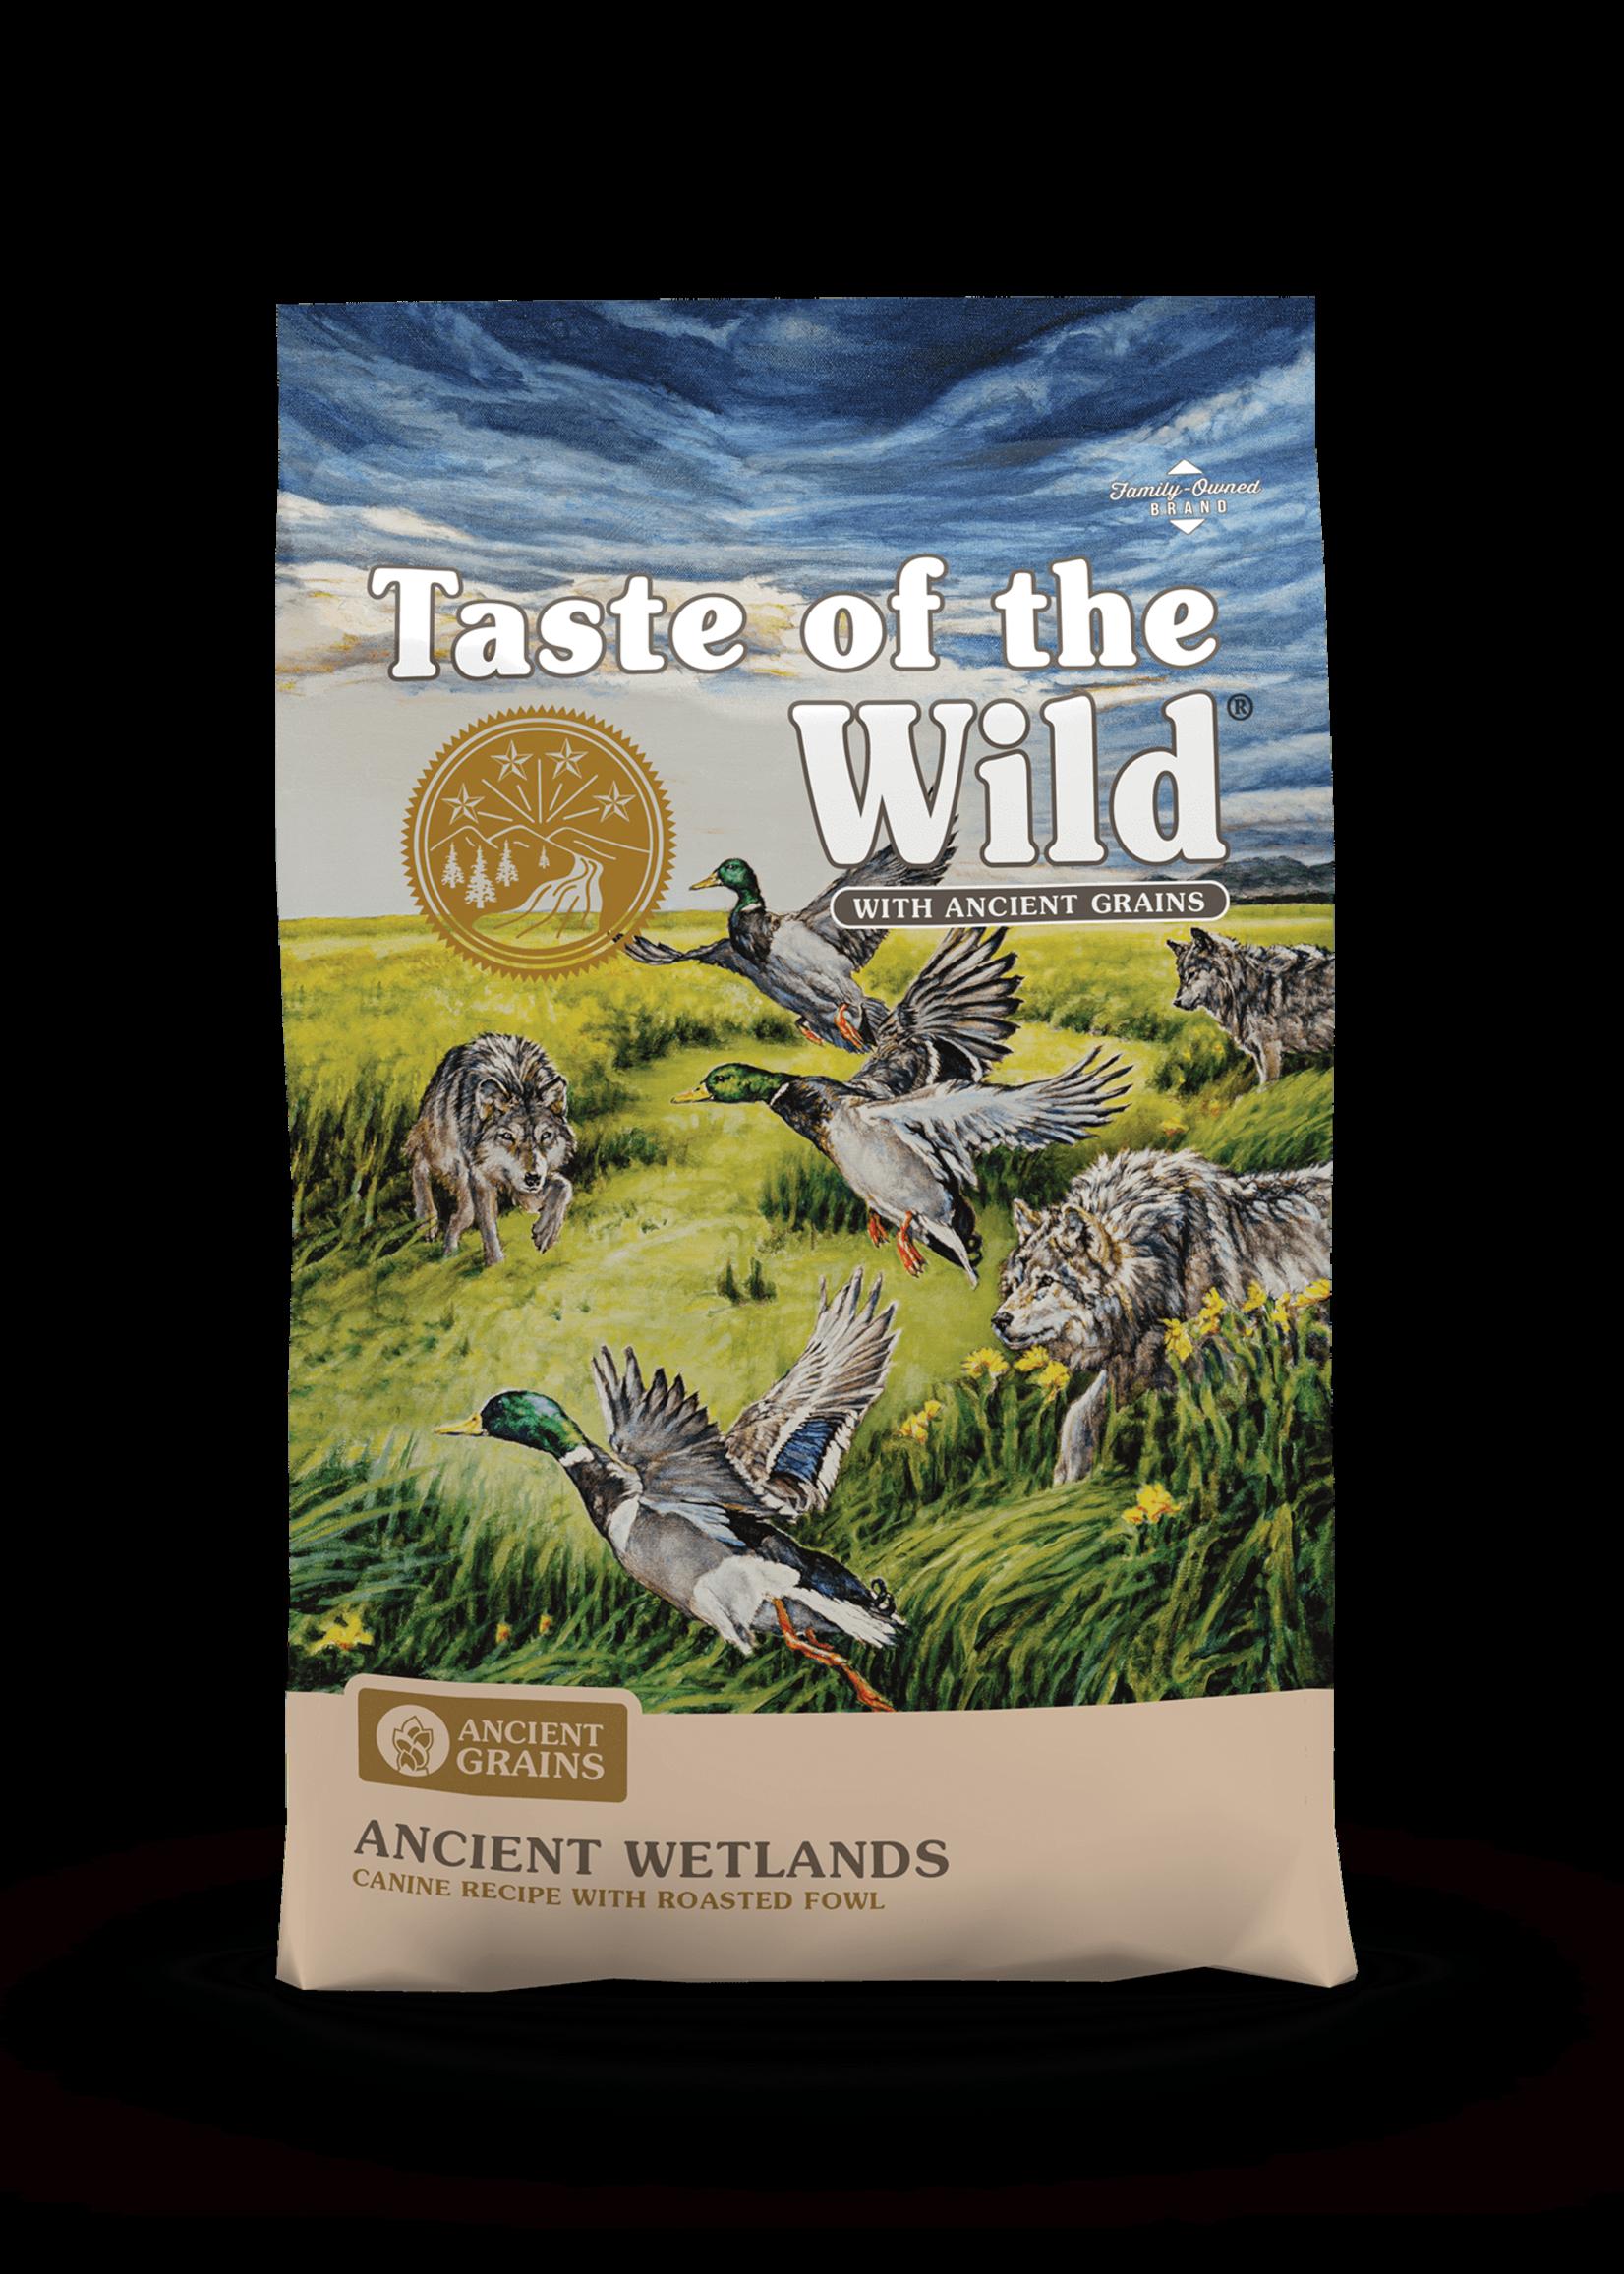 Taste of the Wild Taste of the Wild Ancient Wetlands 28lbs